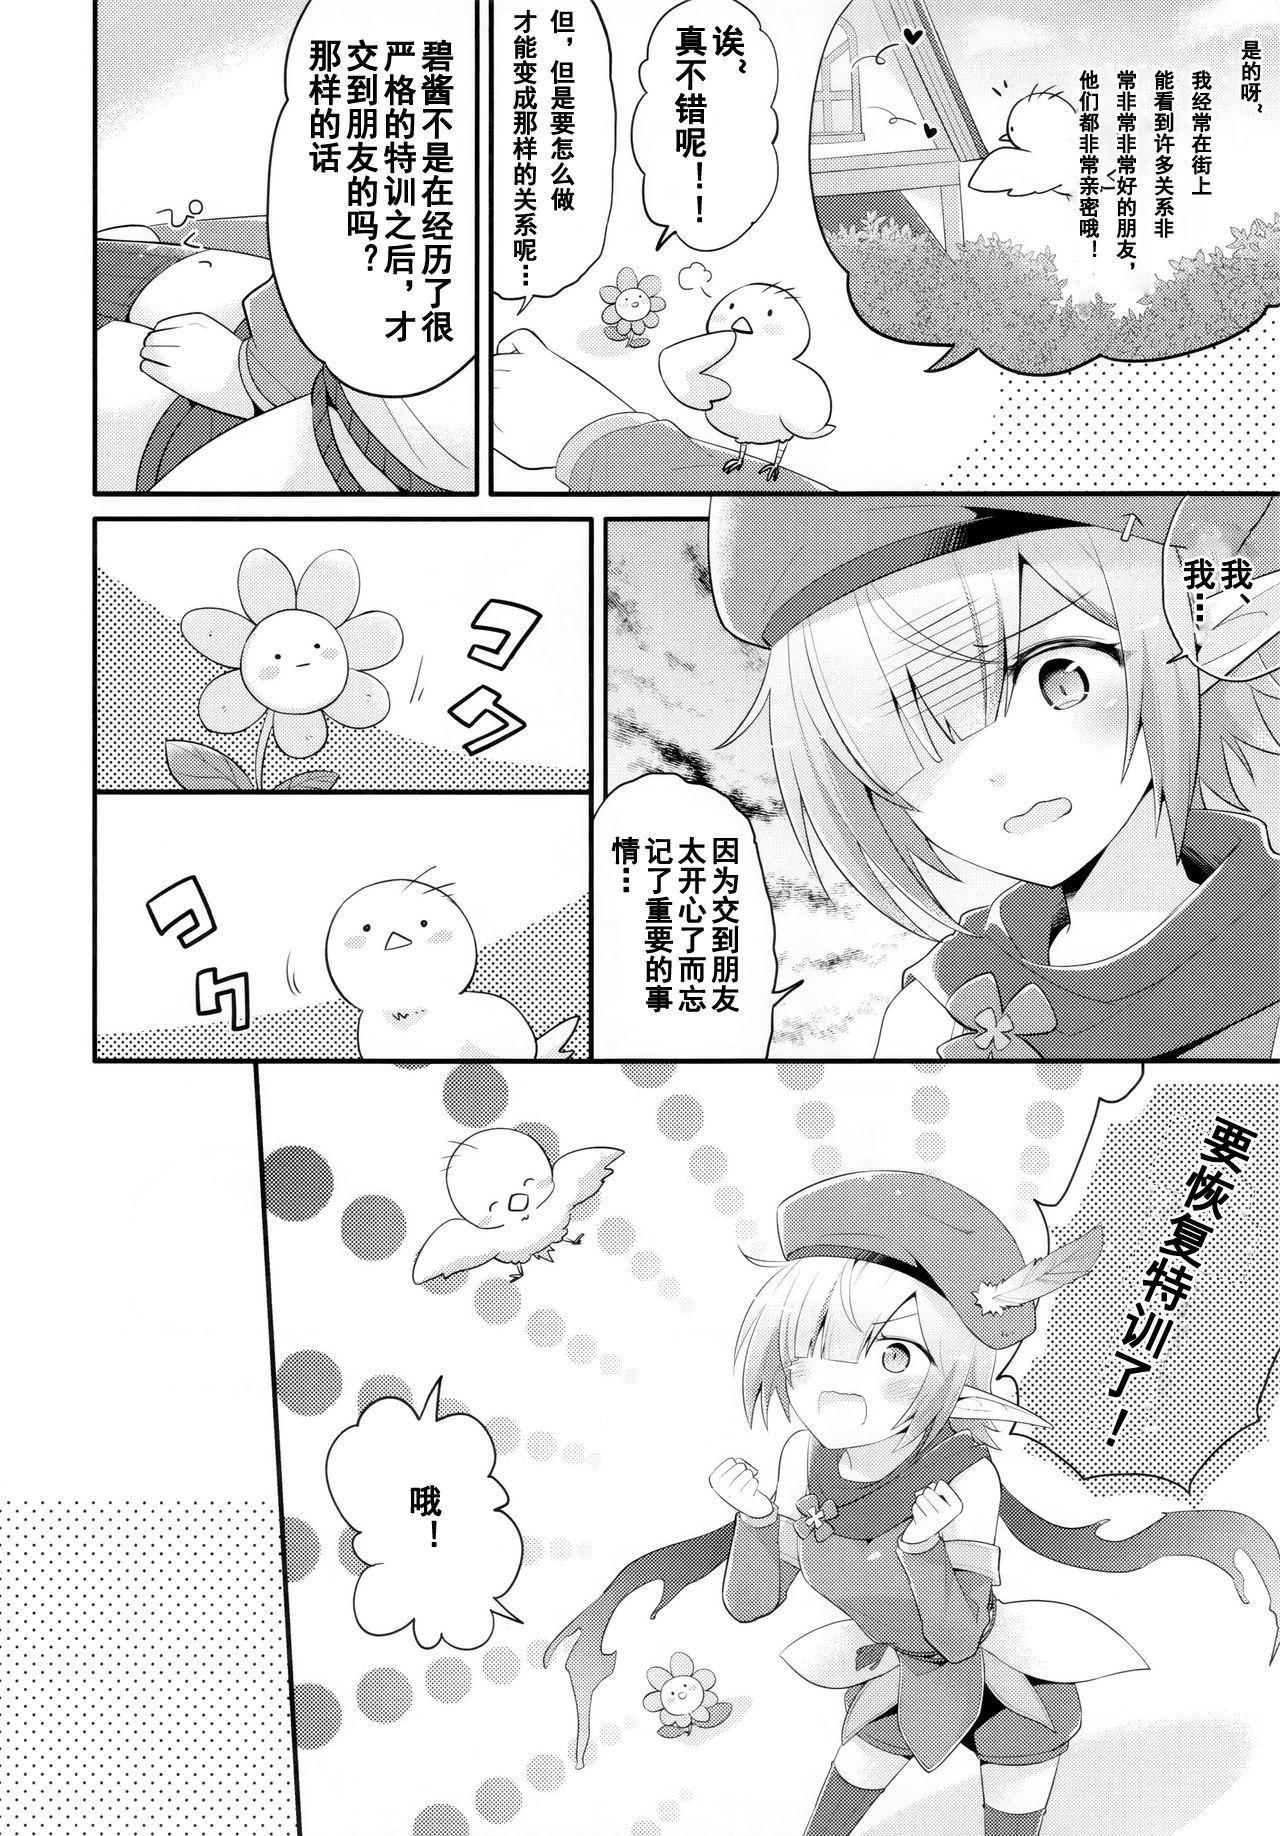 Aoi no Motto Otomodachi Daisakusen 7